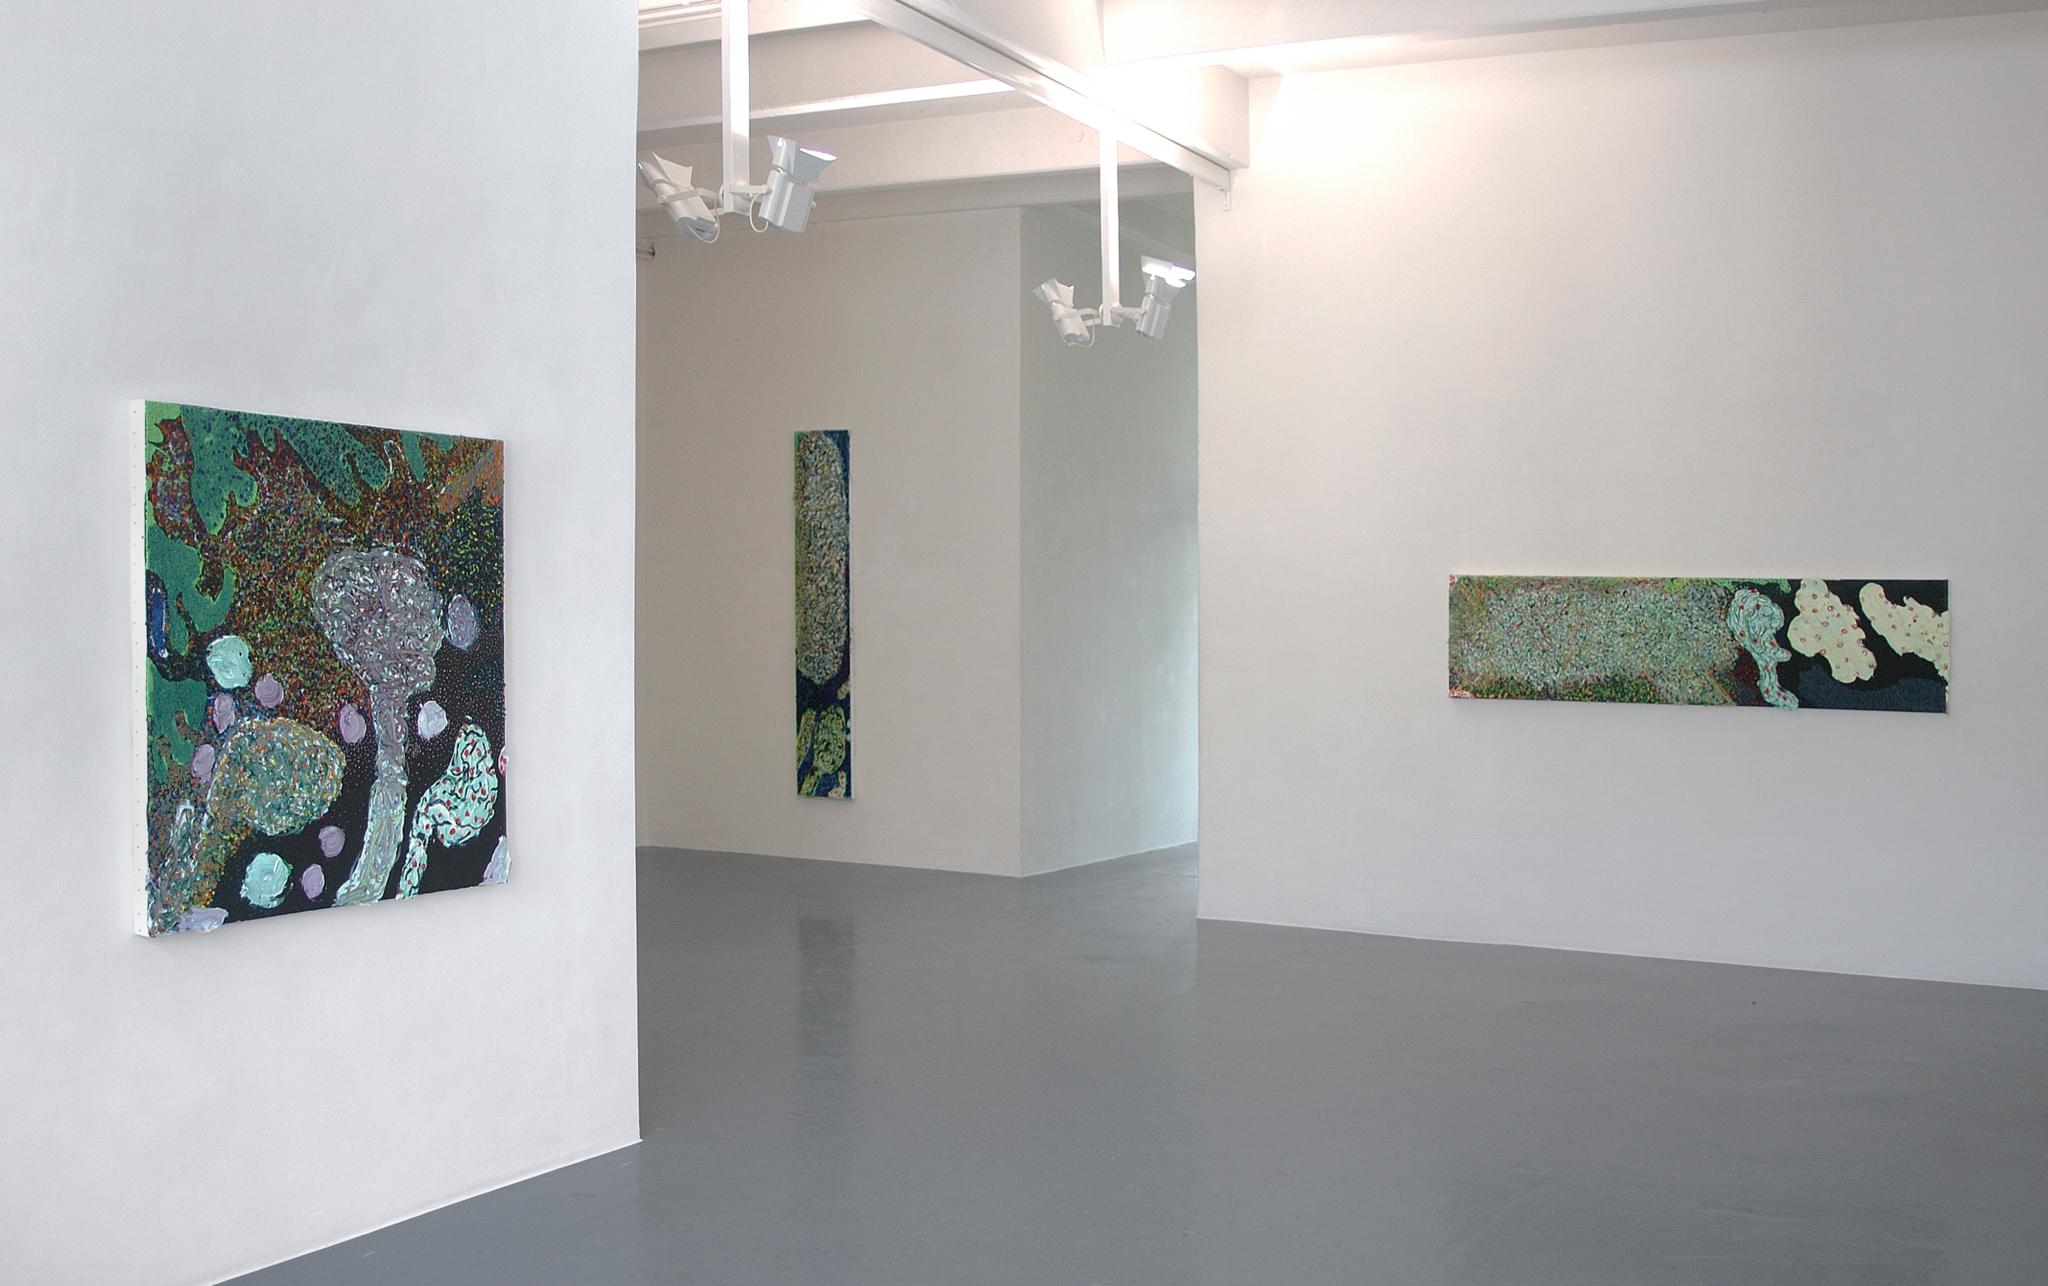 Eli-Content-Galerie-Onrust-works_2009_-herri06.jpg